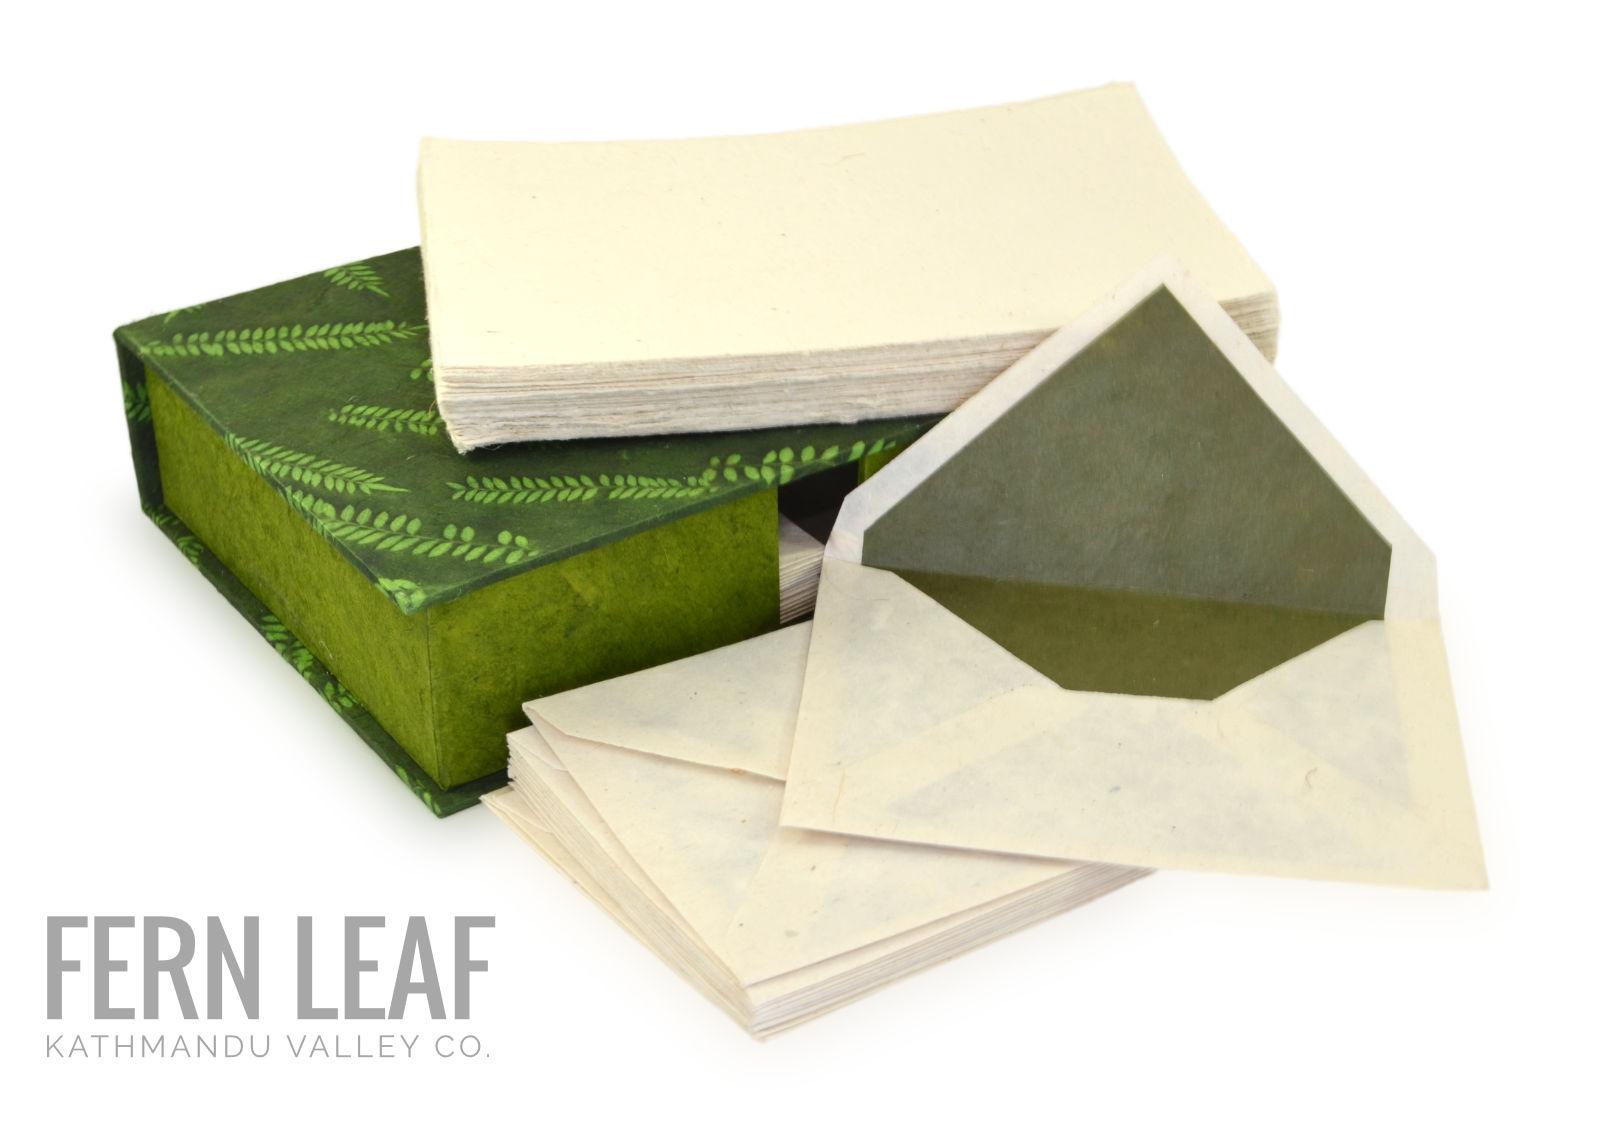 Kathmandu Valley Co. Stationery Gift Box Fern Leaf